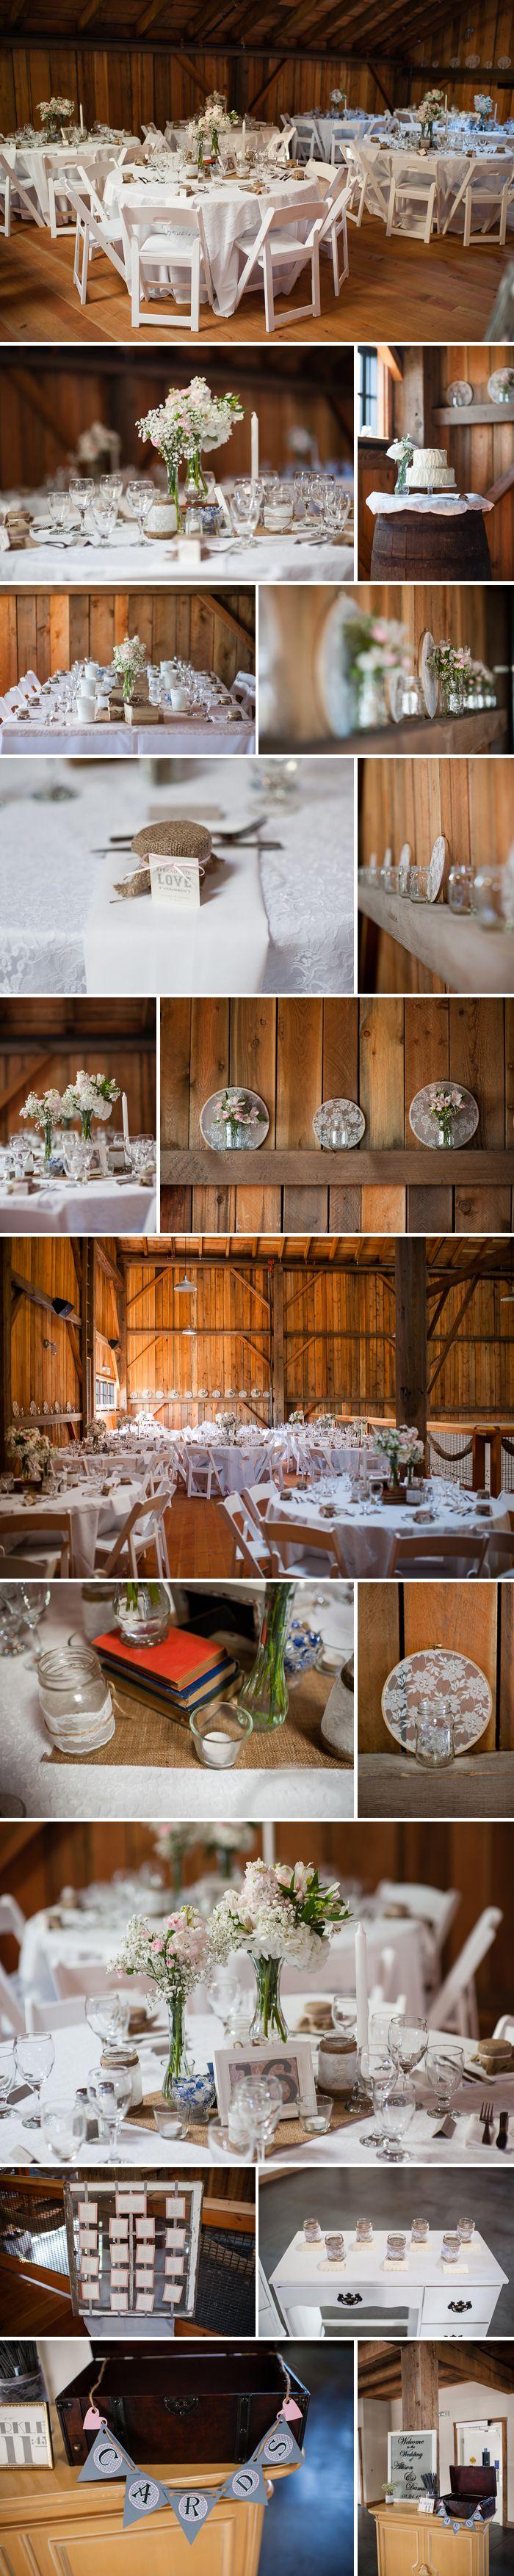 http://terynleephotography.com/blog/kirkland-house-wedding-allison-damien/